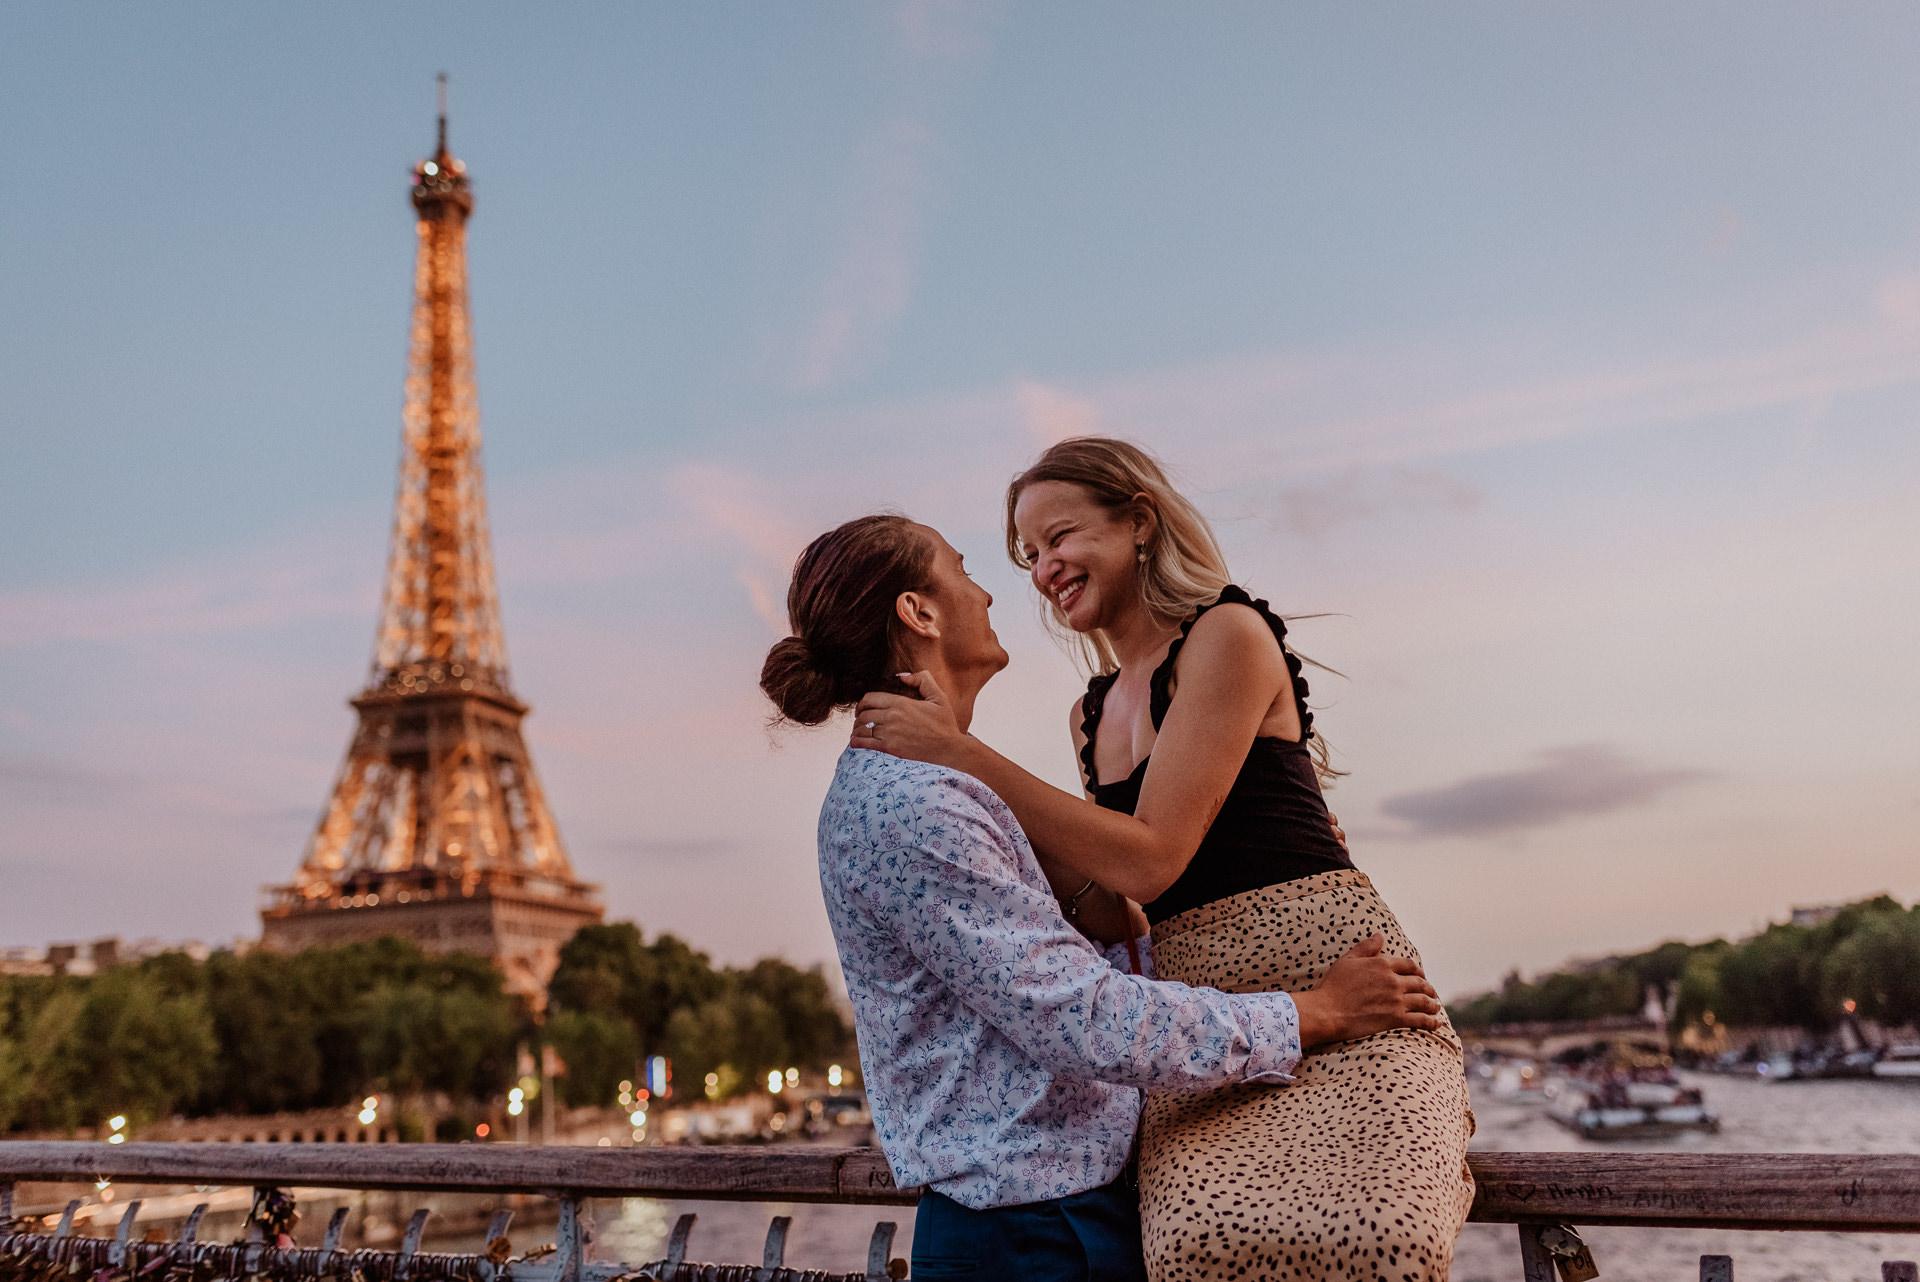 Eiffel tower photoshoot